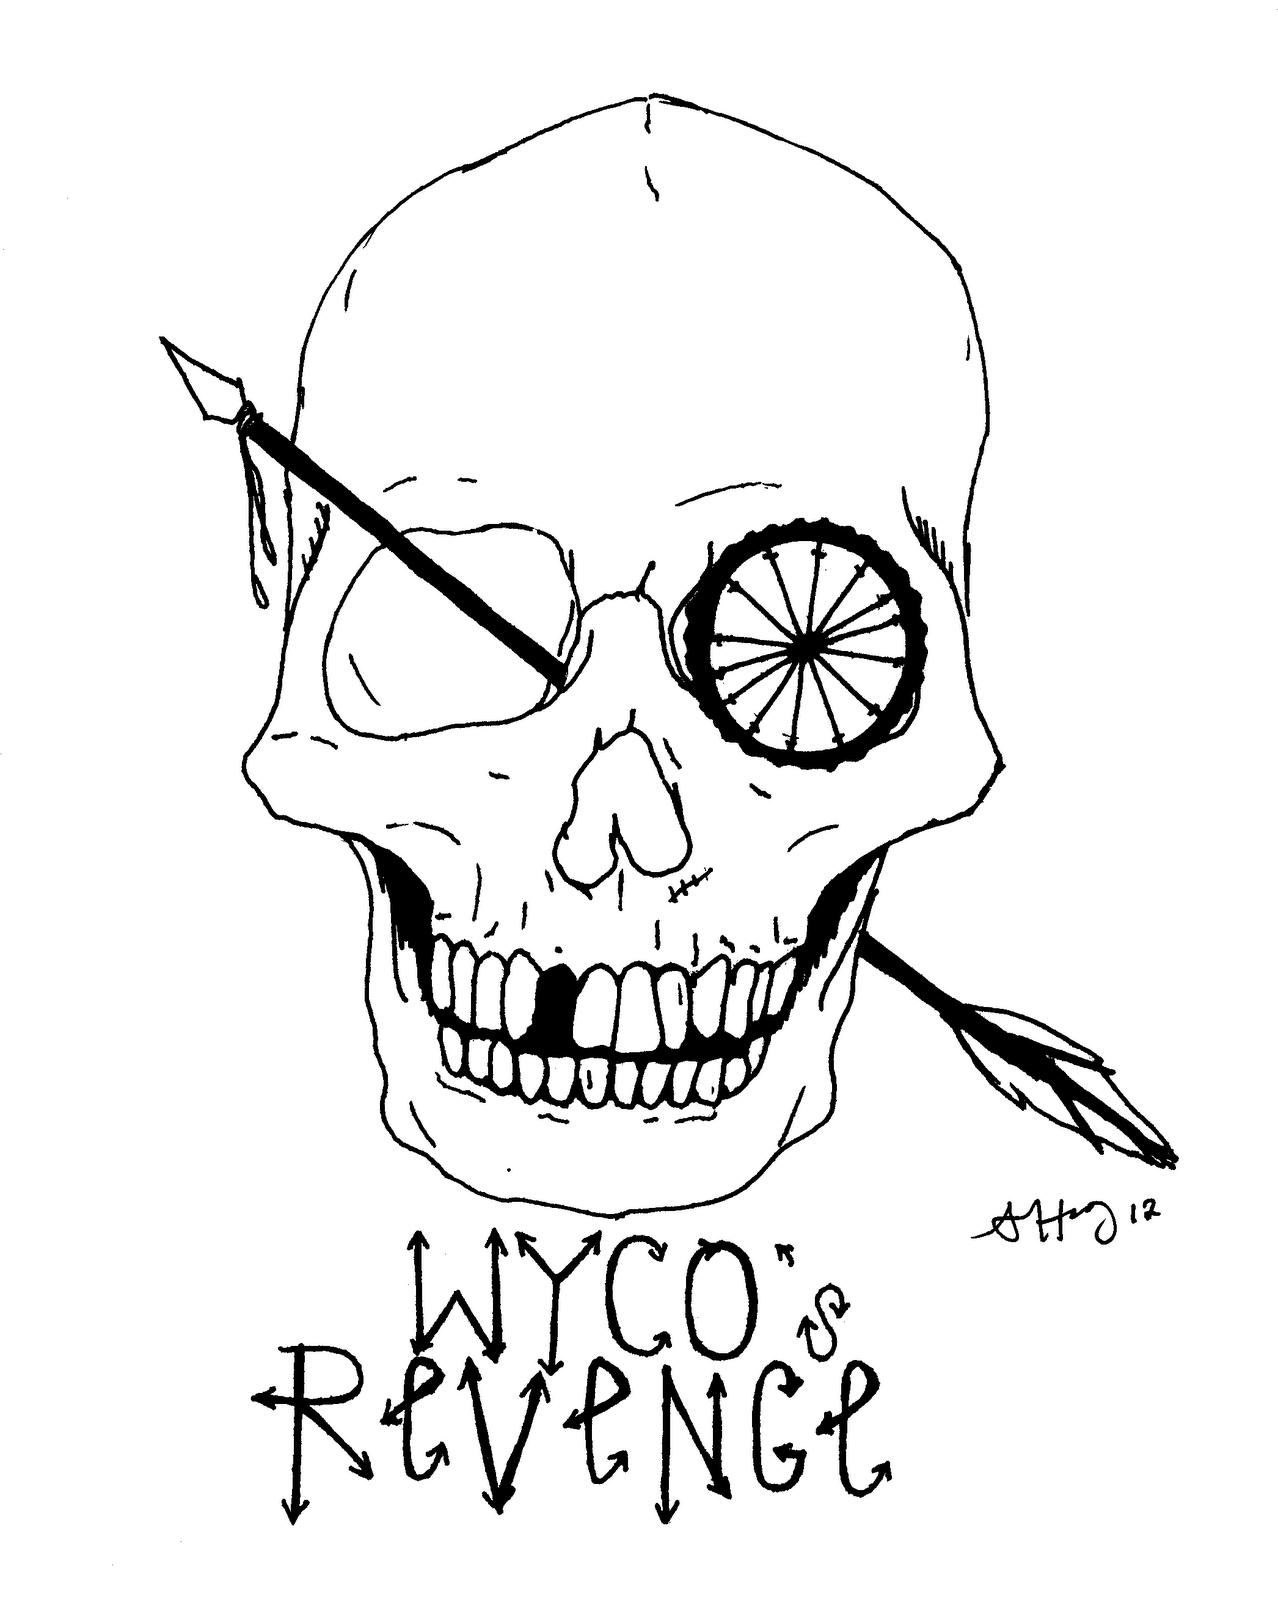 Wyco's Revenge: Wyco's Revenge Logo